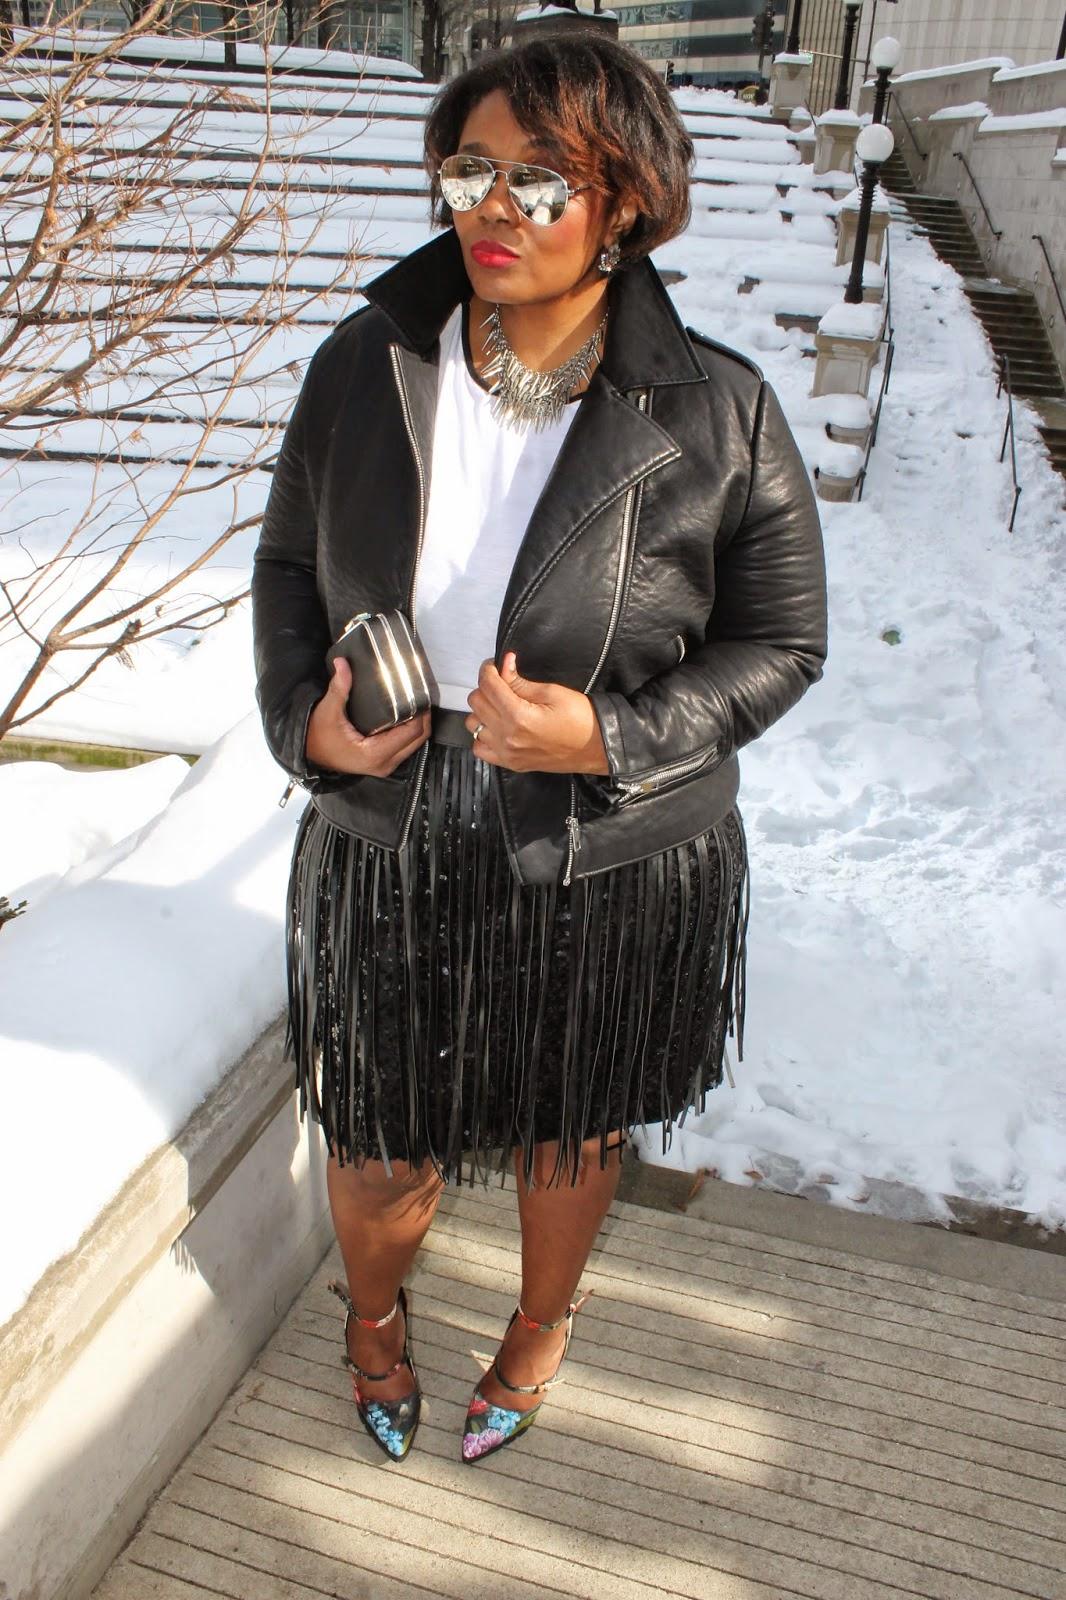 Rocker Chic Valentines Day Style Plus Size Sequins Fringe Floral Pumps